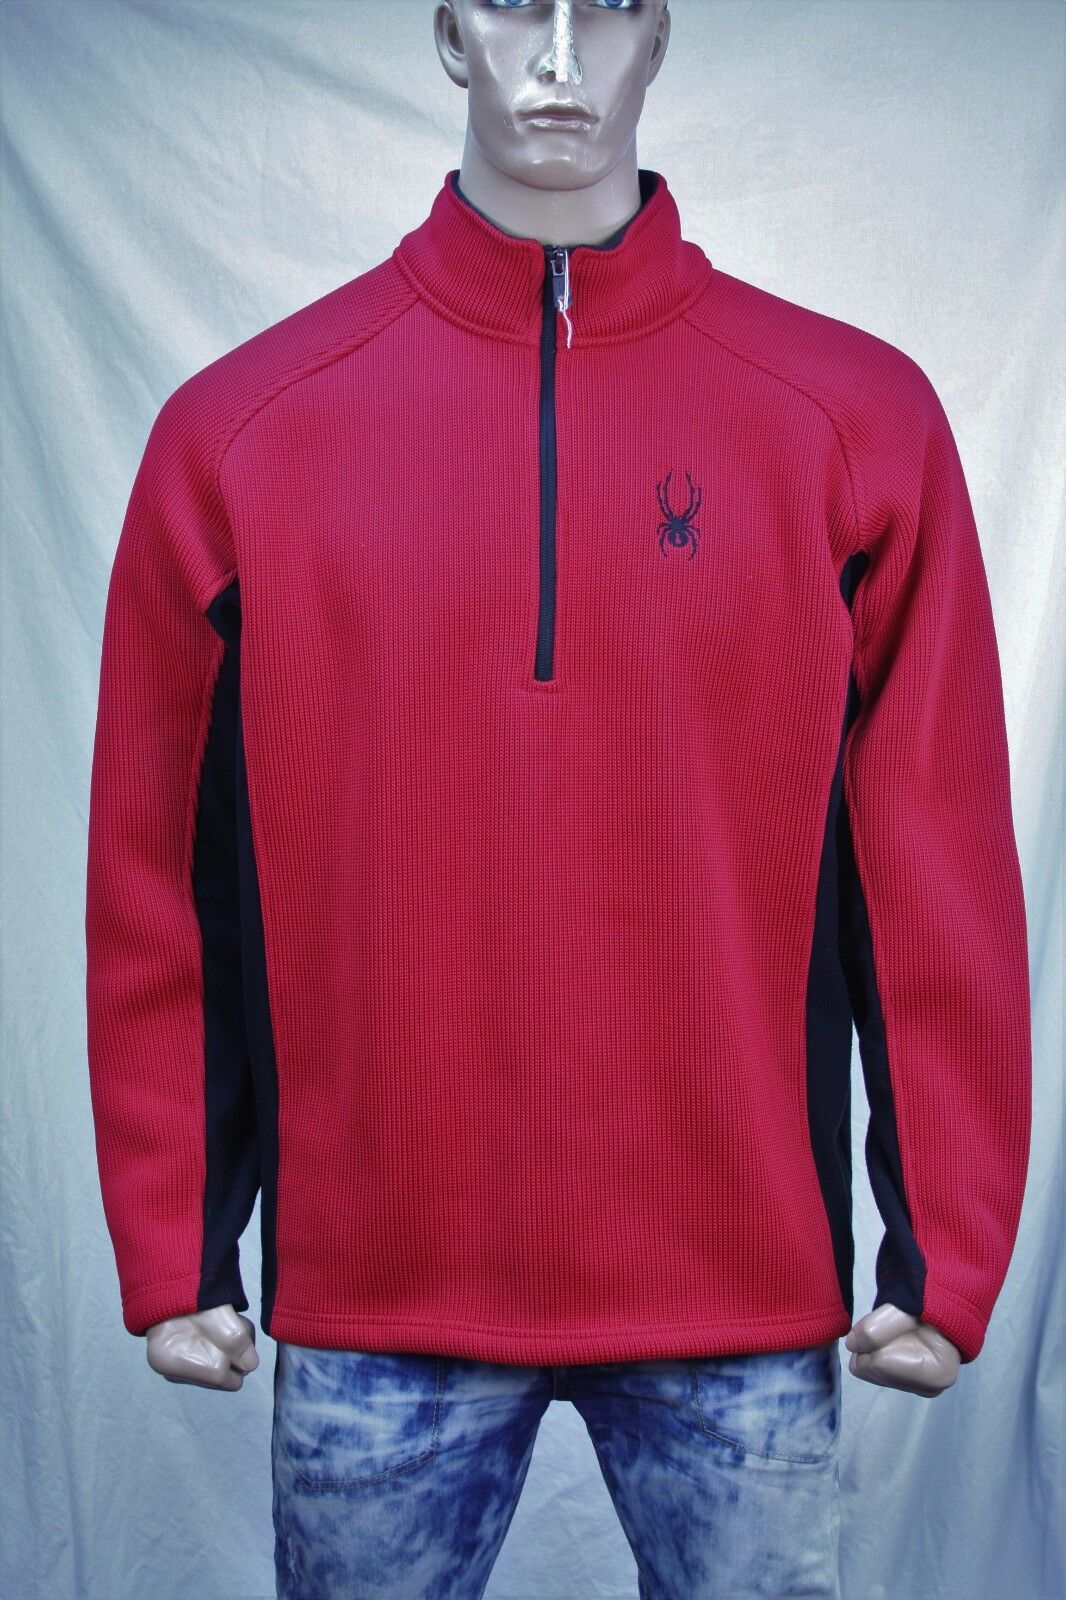 Authentic Spyder  Men's half zip polyester sweater US XL